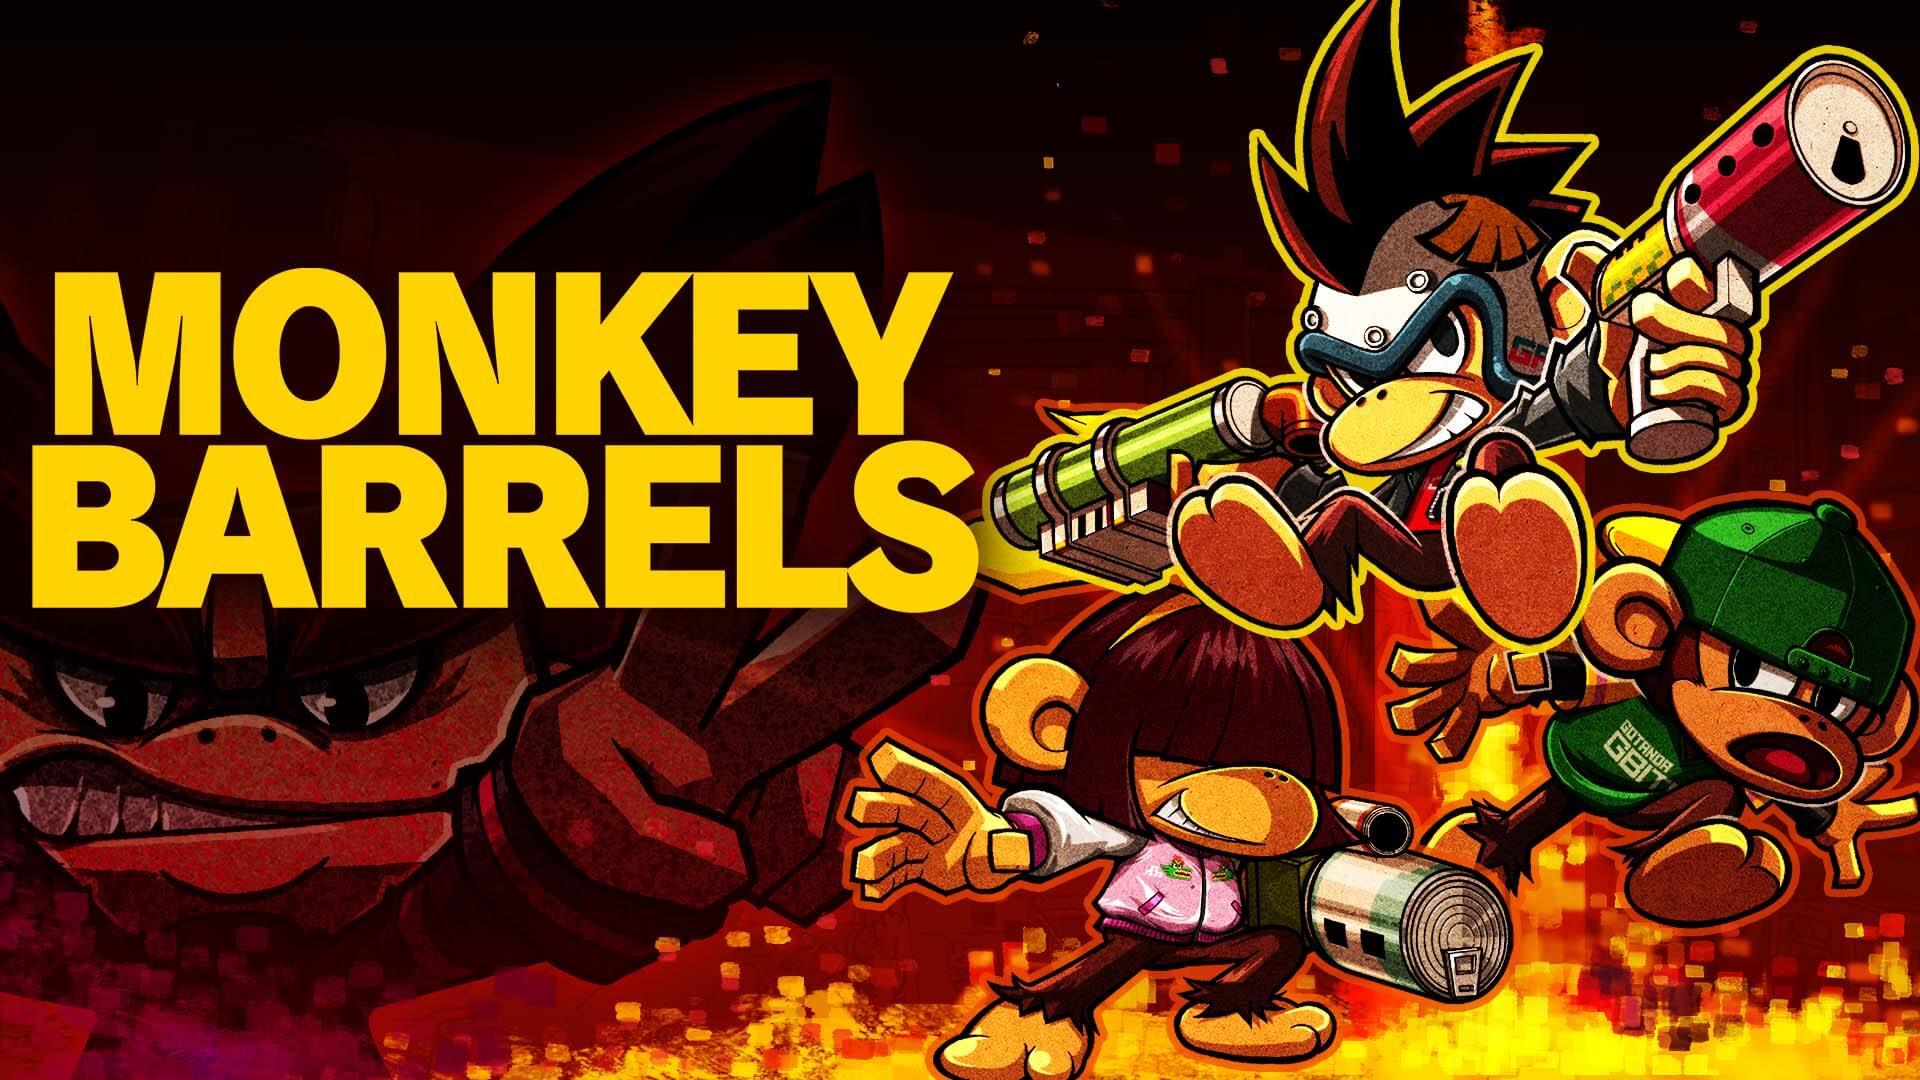 Monkey Barrels Free PC Download